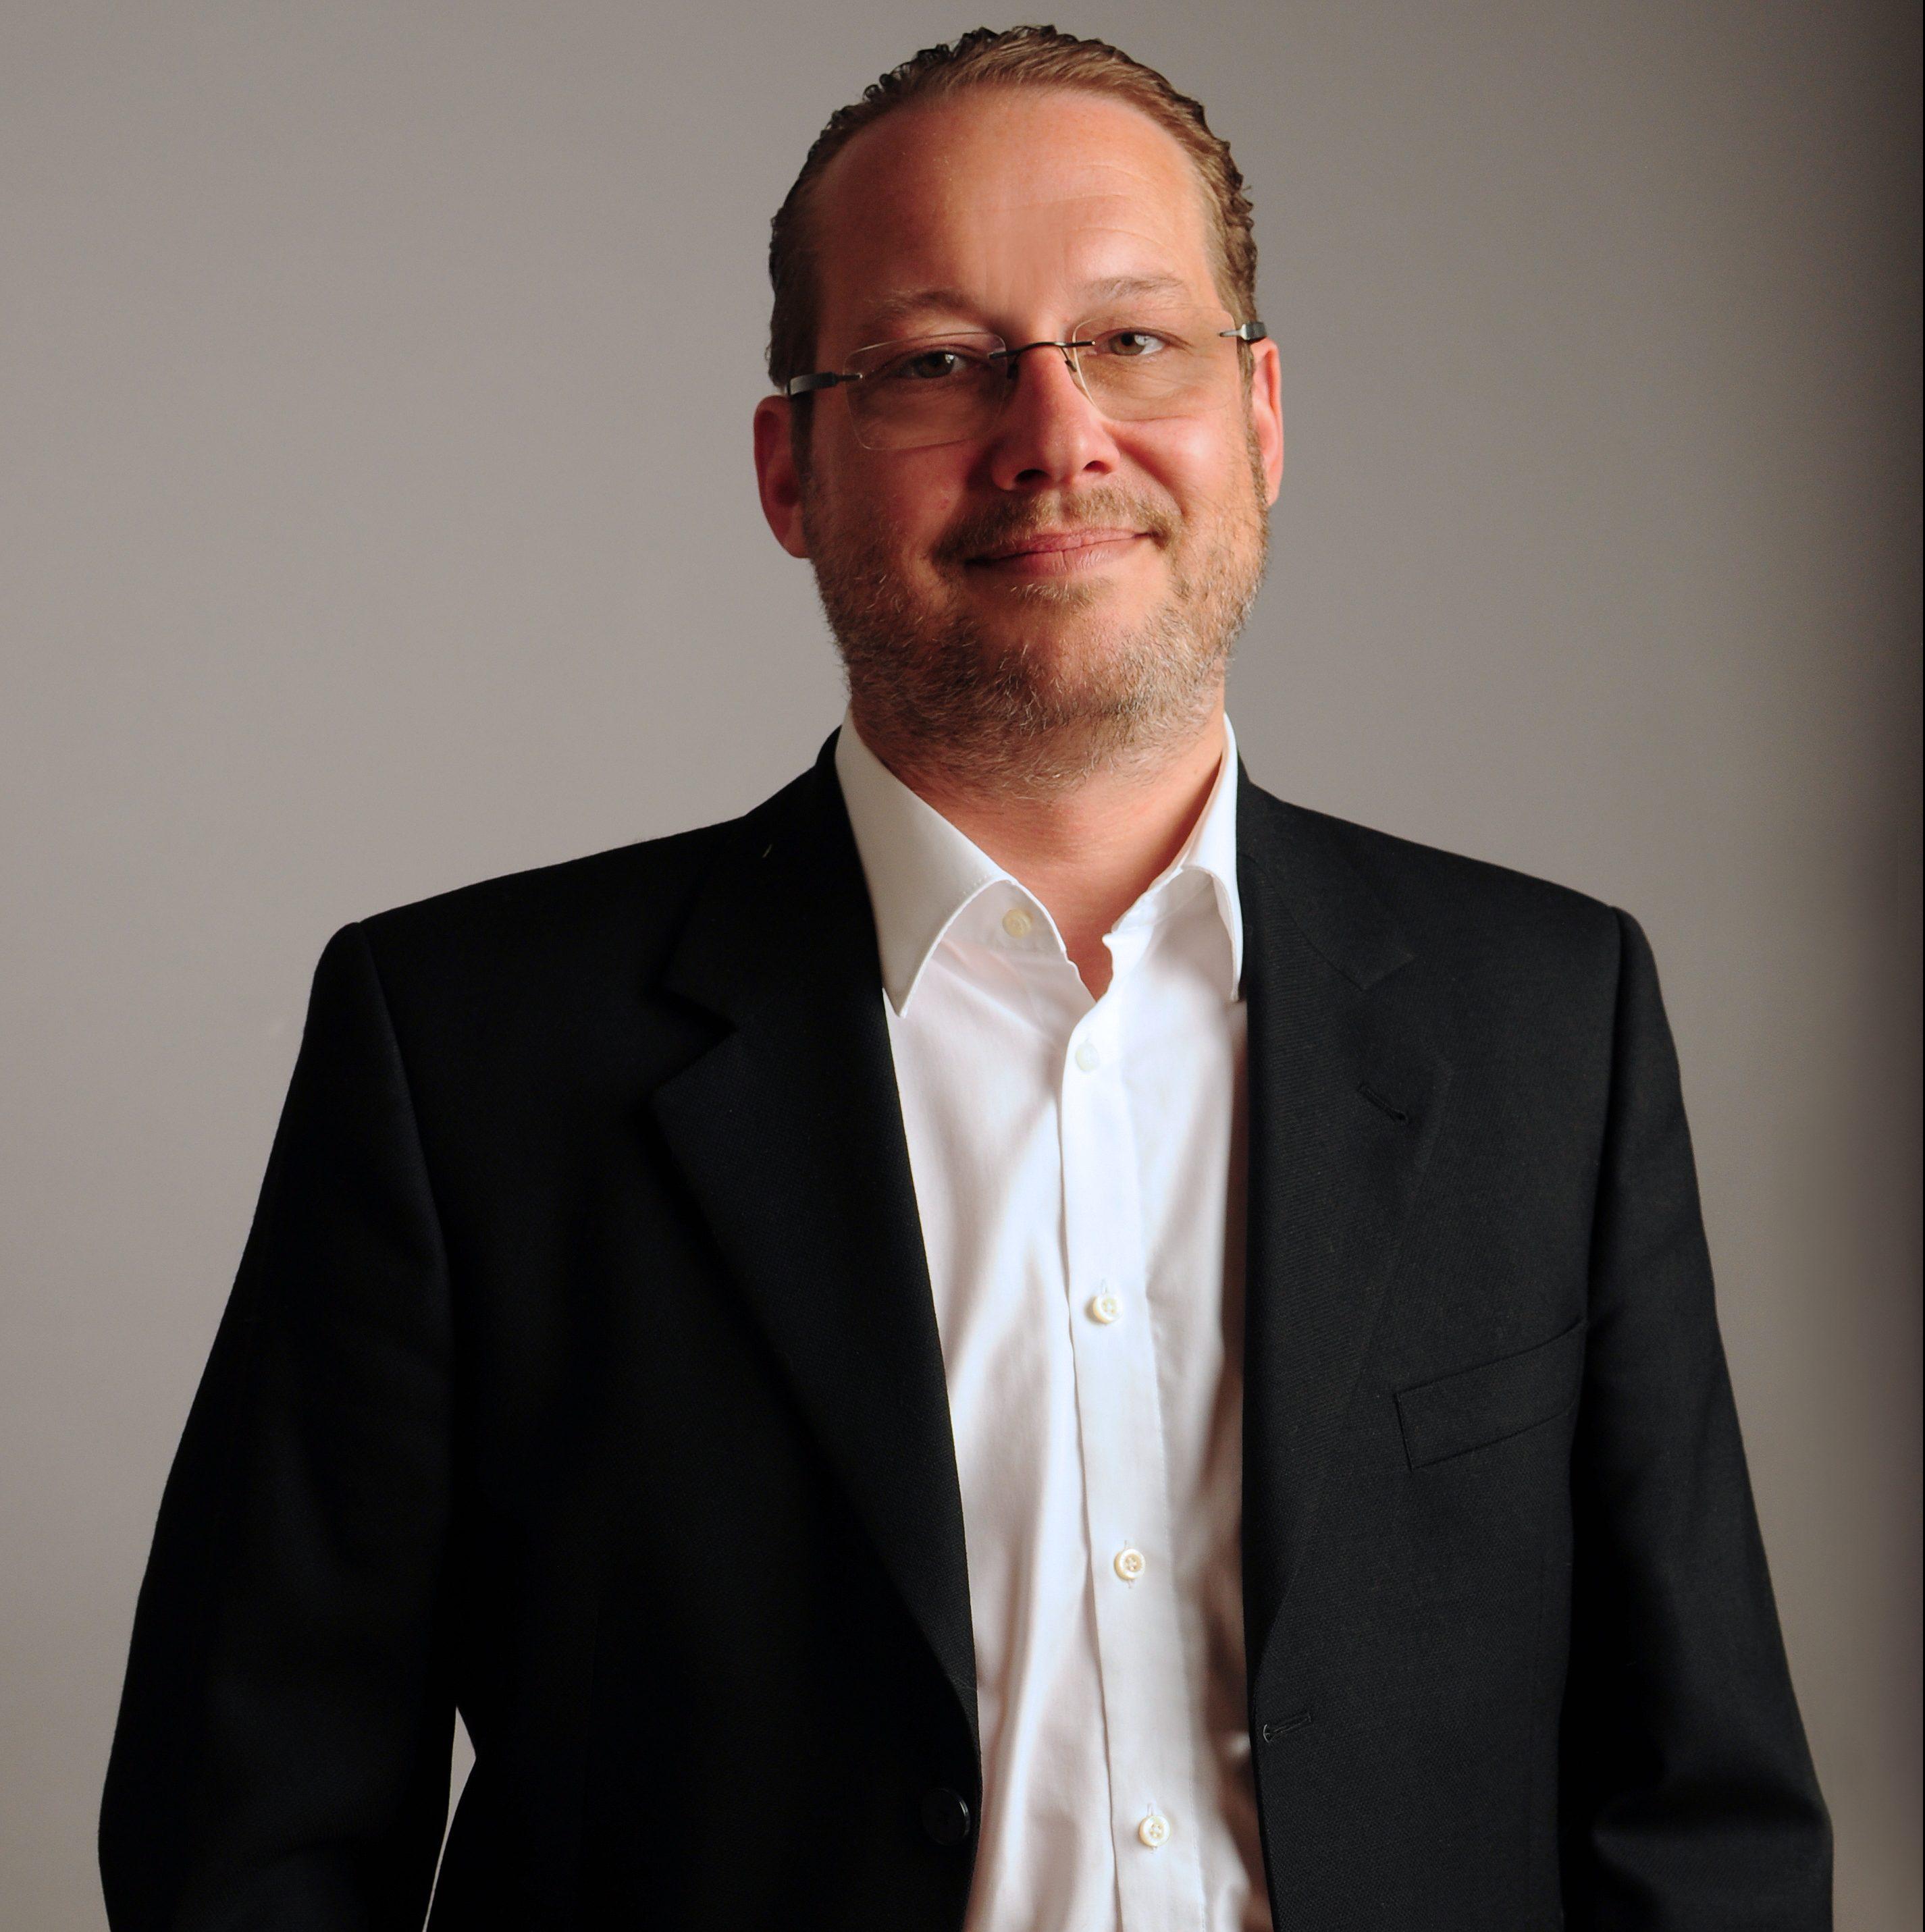 Niels Kretzschmar Beisitzer im Vorstand des BBGM e. V.